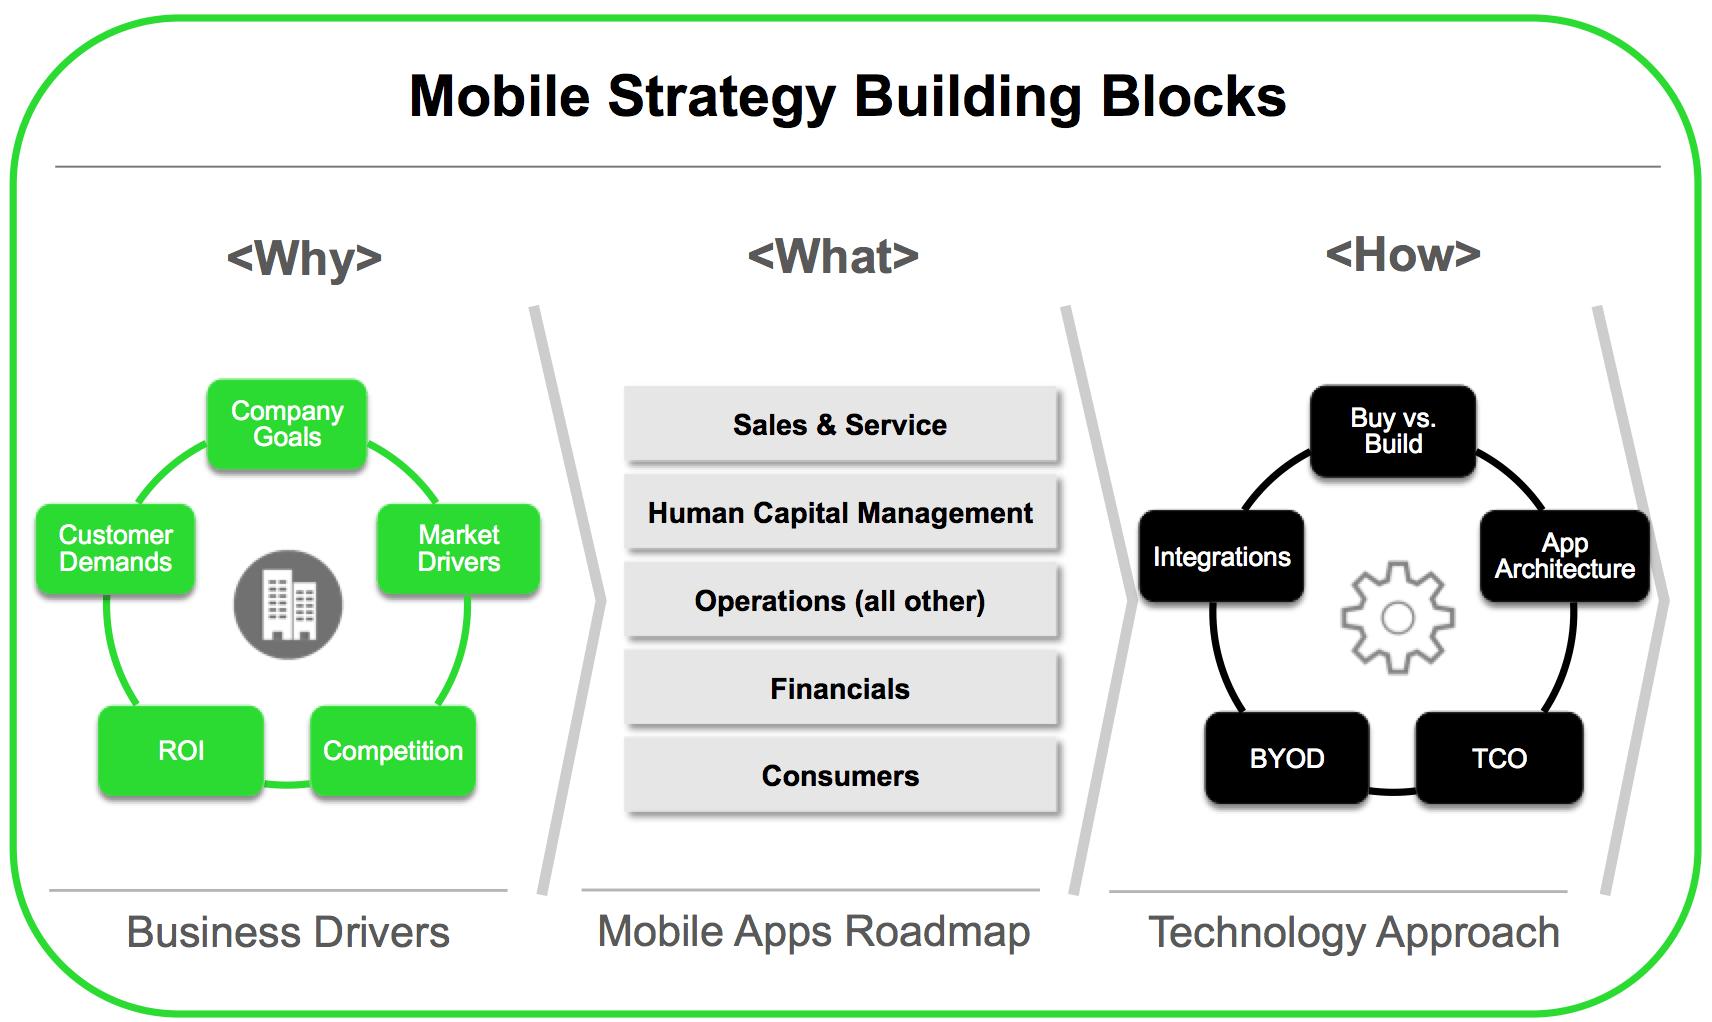 enterprise-mobile-strategy-building-blocks-png